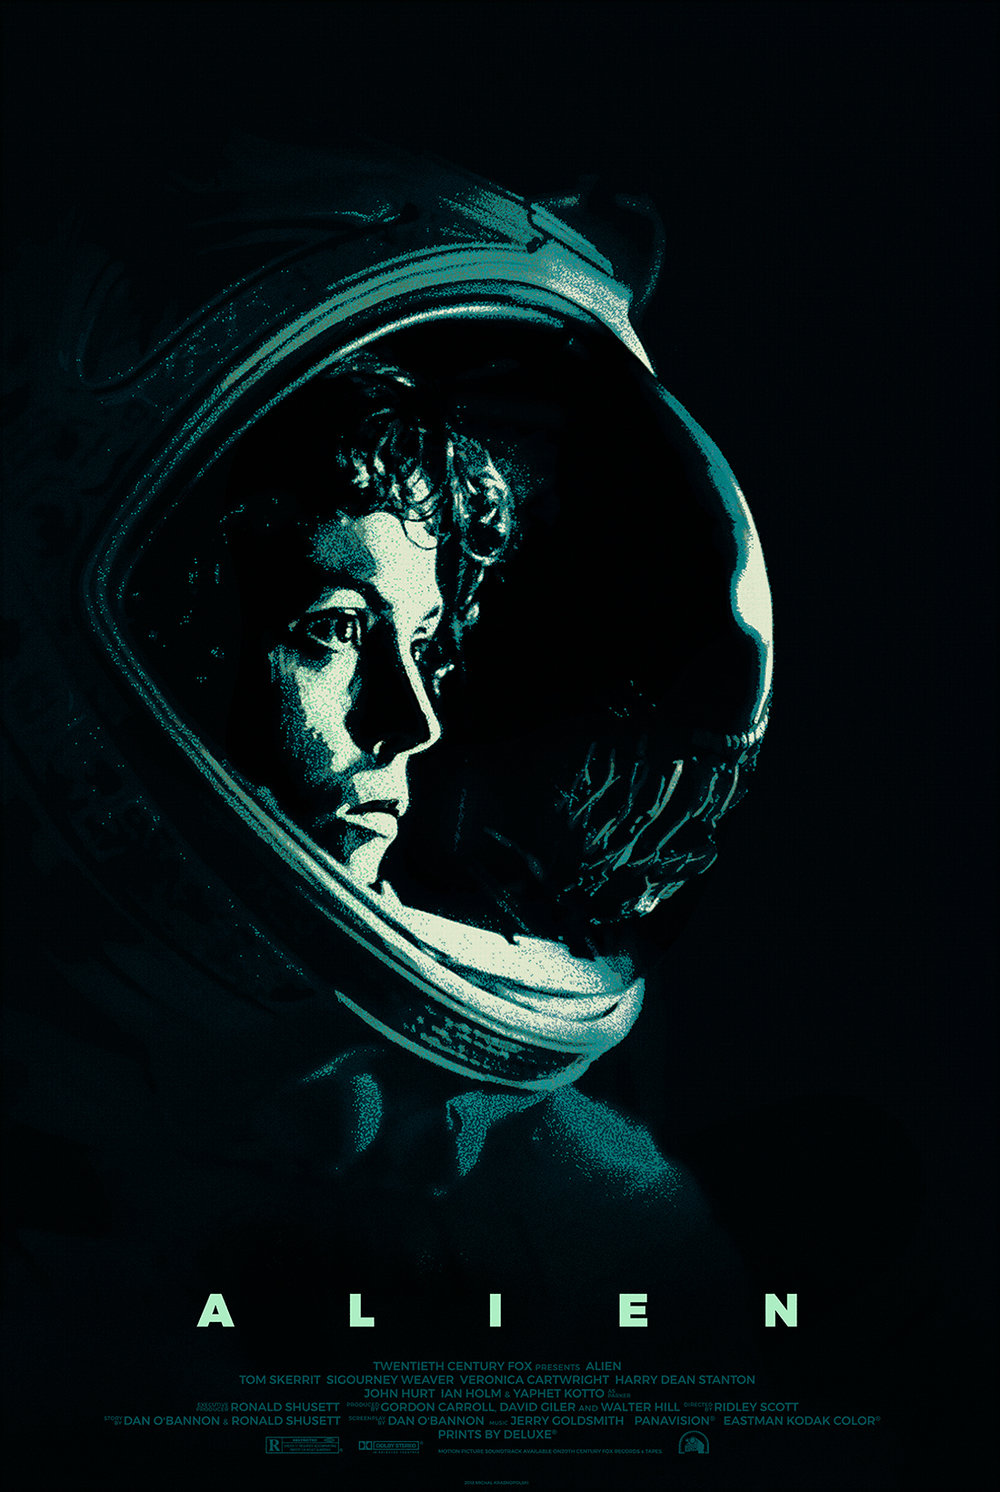 krasnopolski_alien-v2.jpg